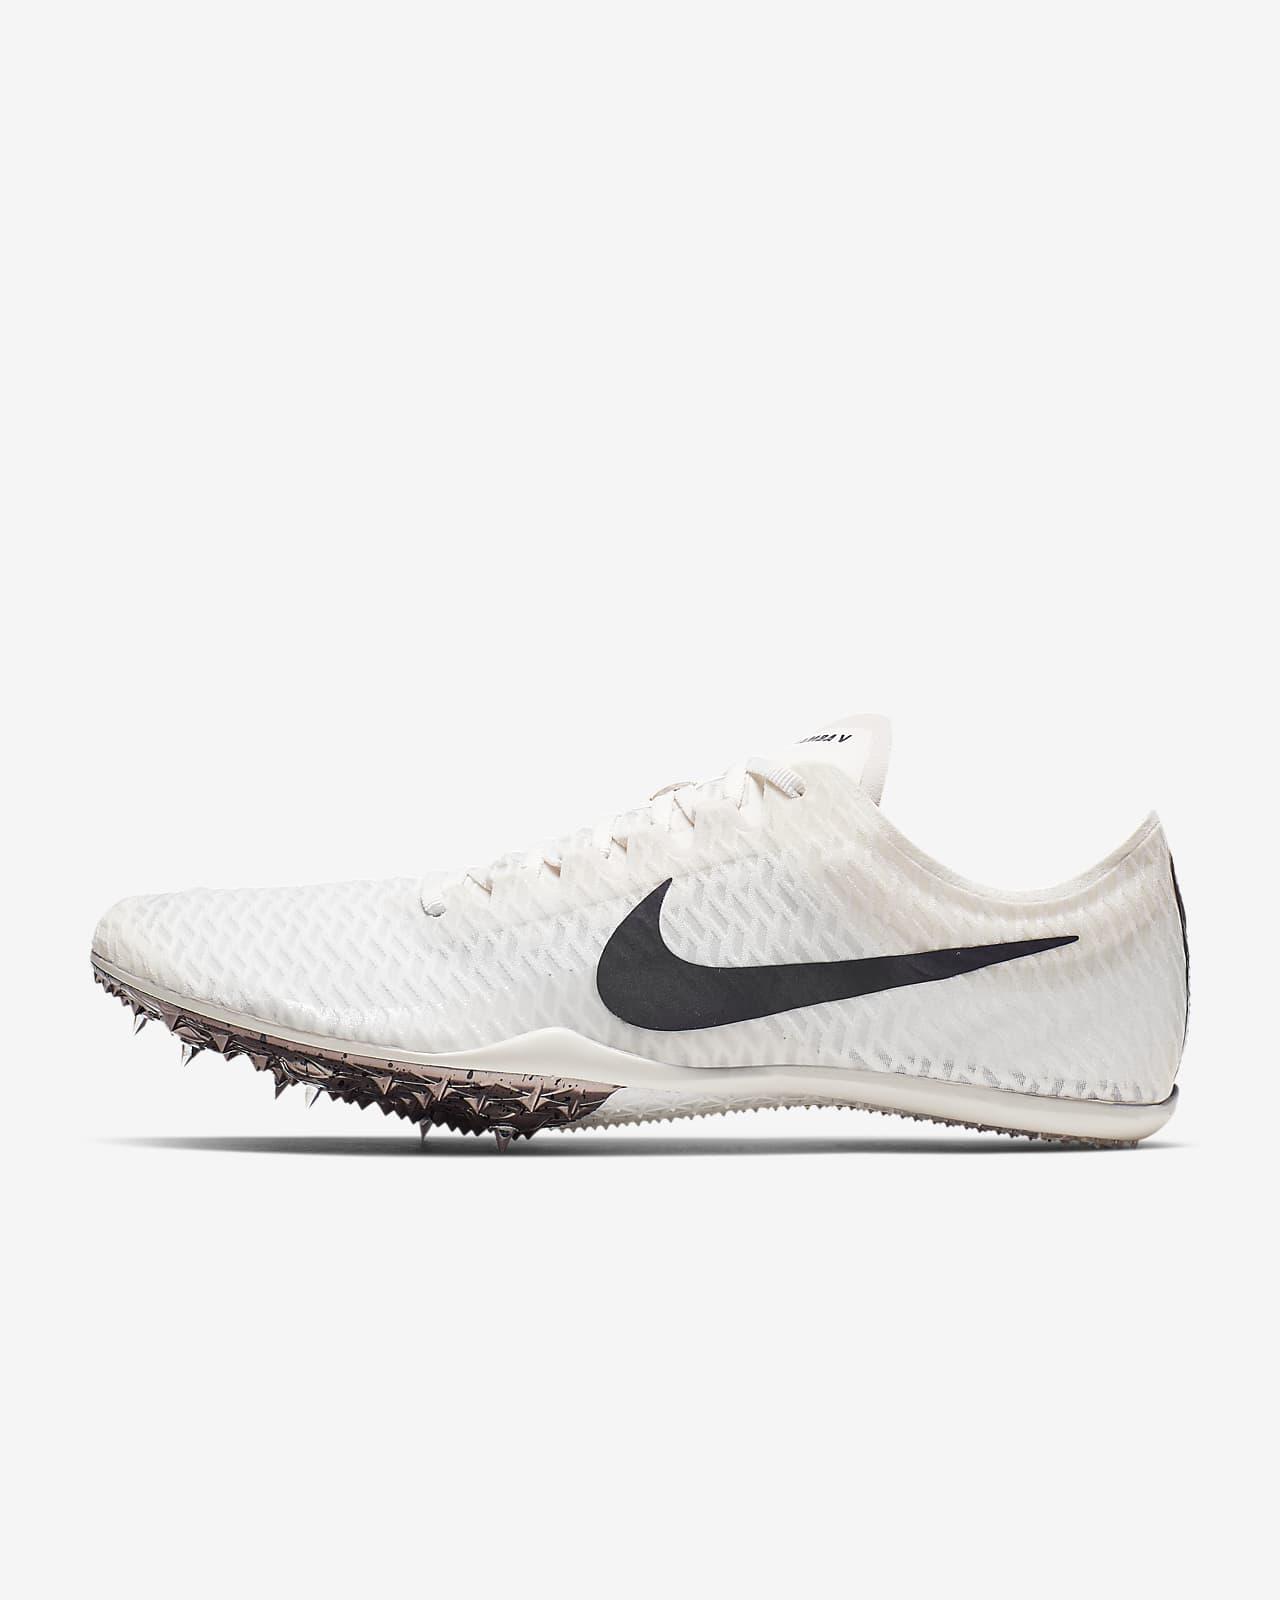 Sapatilhas de running Nike Zoom Mamba V